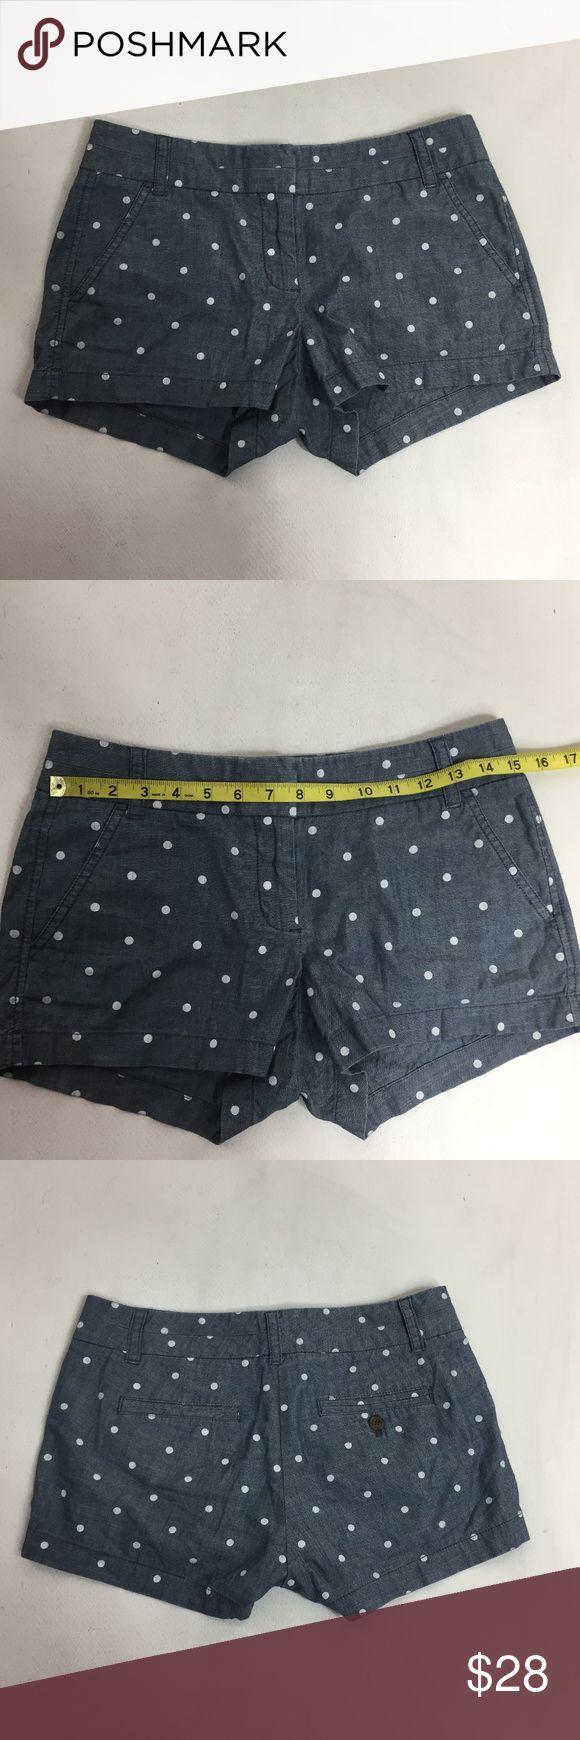 J CREW Womens Shorts Sz 2 City Fit Polka Dot Mini J. CREW Womens Shorts Style 50711  100% Cotton   Size: 2  Condition: gently worn  A5501zkE J. Crew Shorts